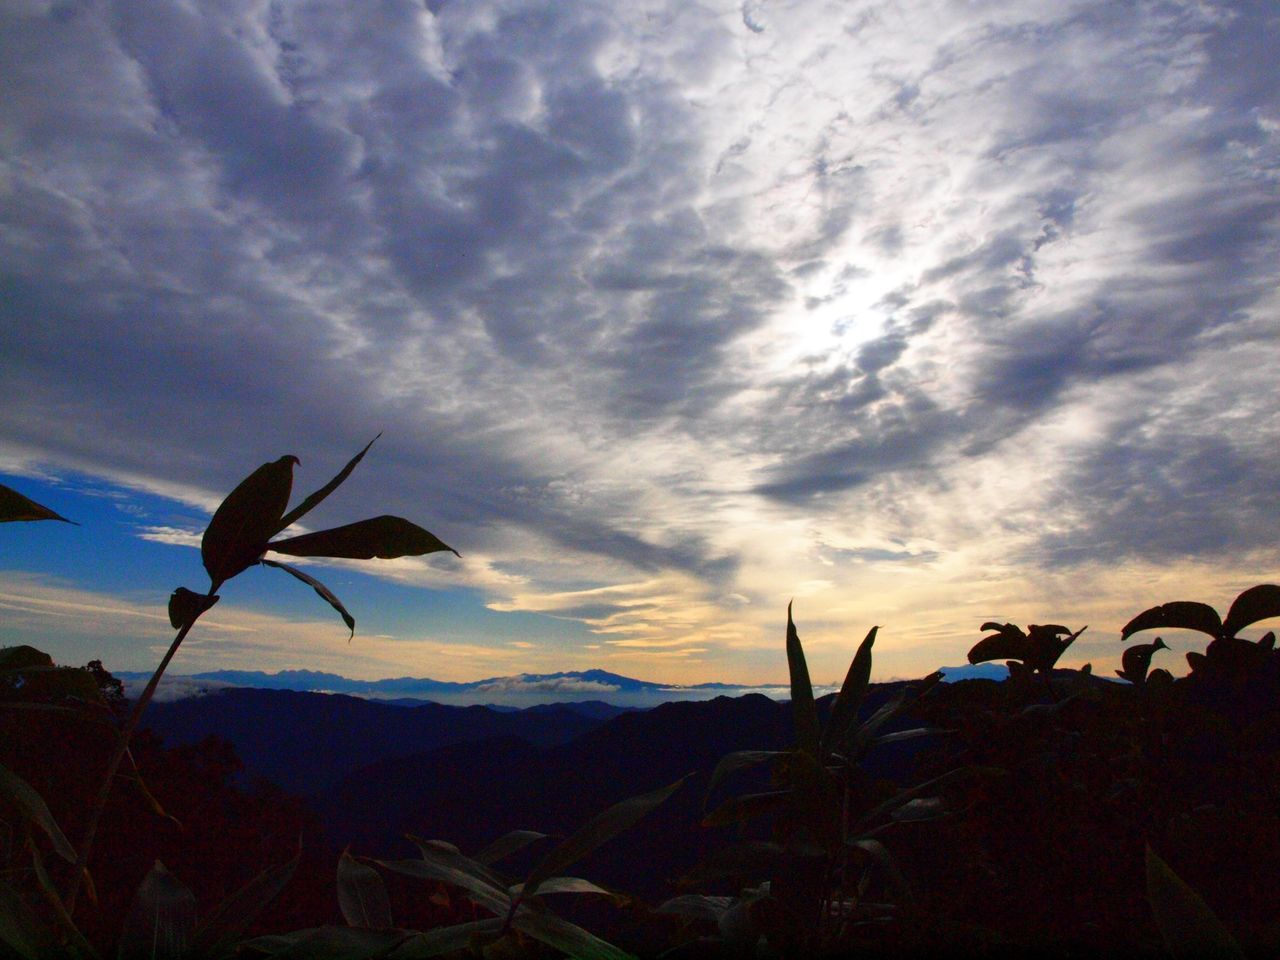 Hakusan Sky Mountain Sunlight Flowers